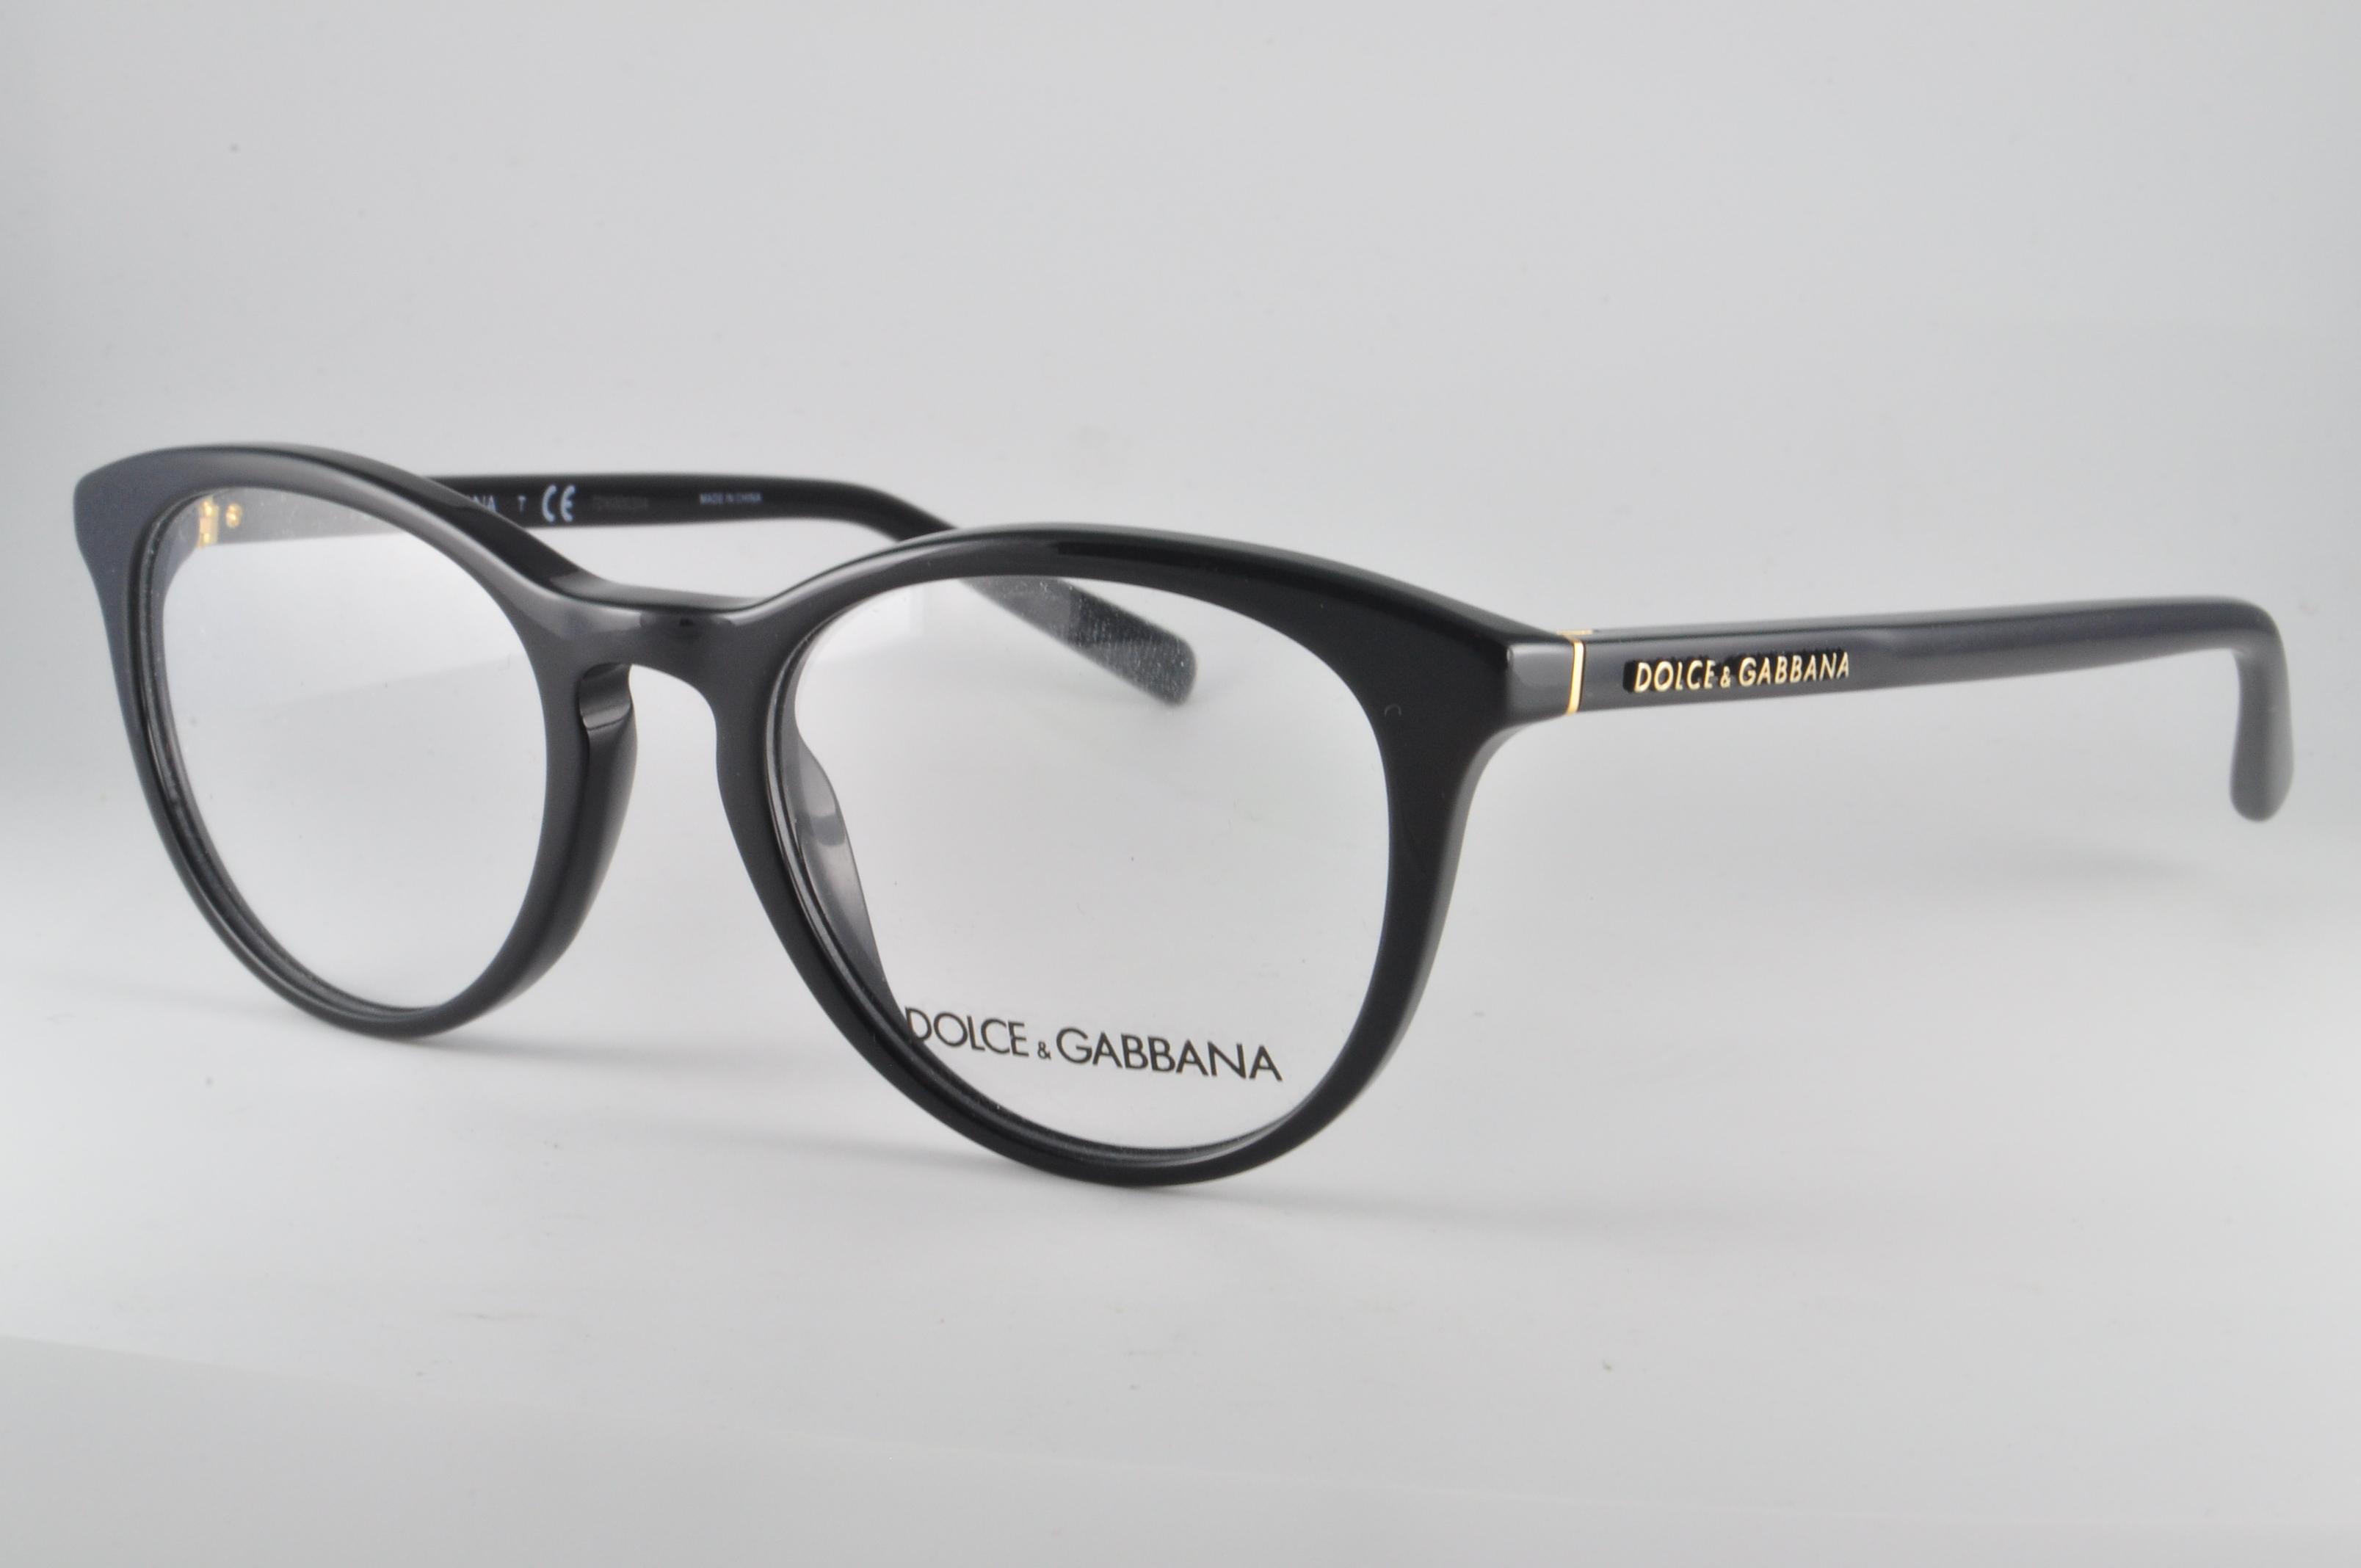 EAN 8053672353747 - Dolce & Gabbana Dg 3223 (501) 47-18-140 Original ...